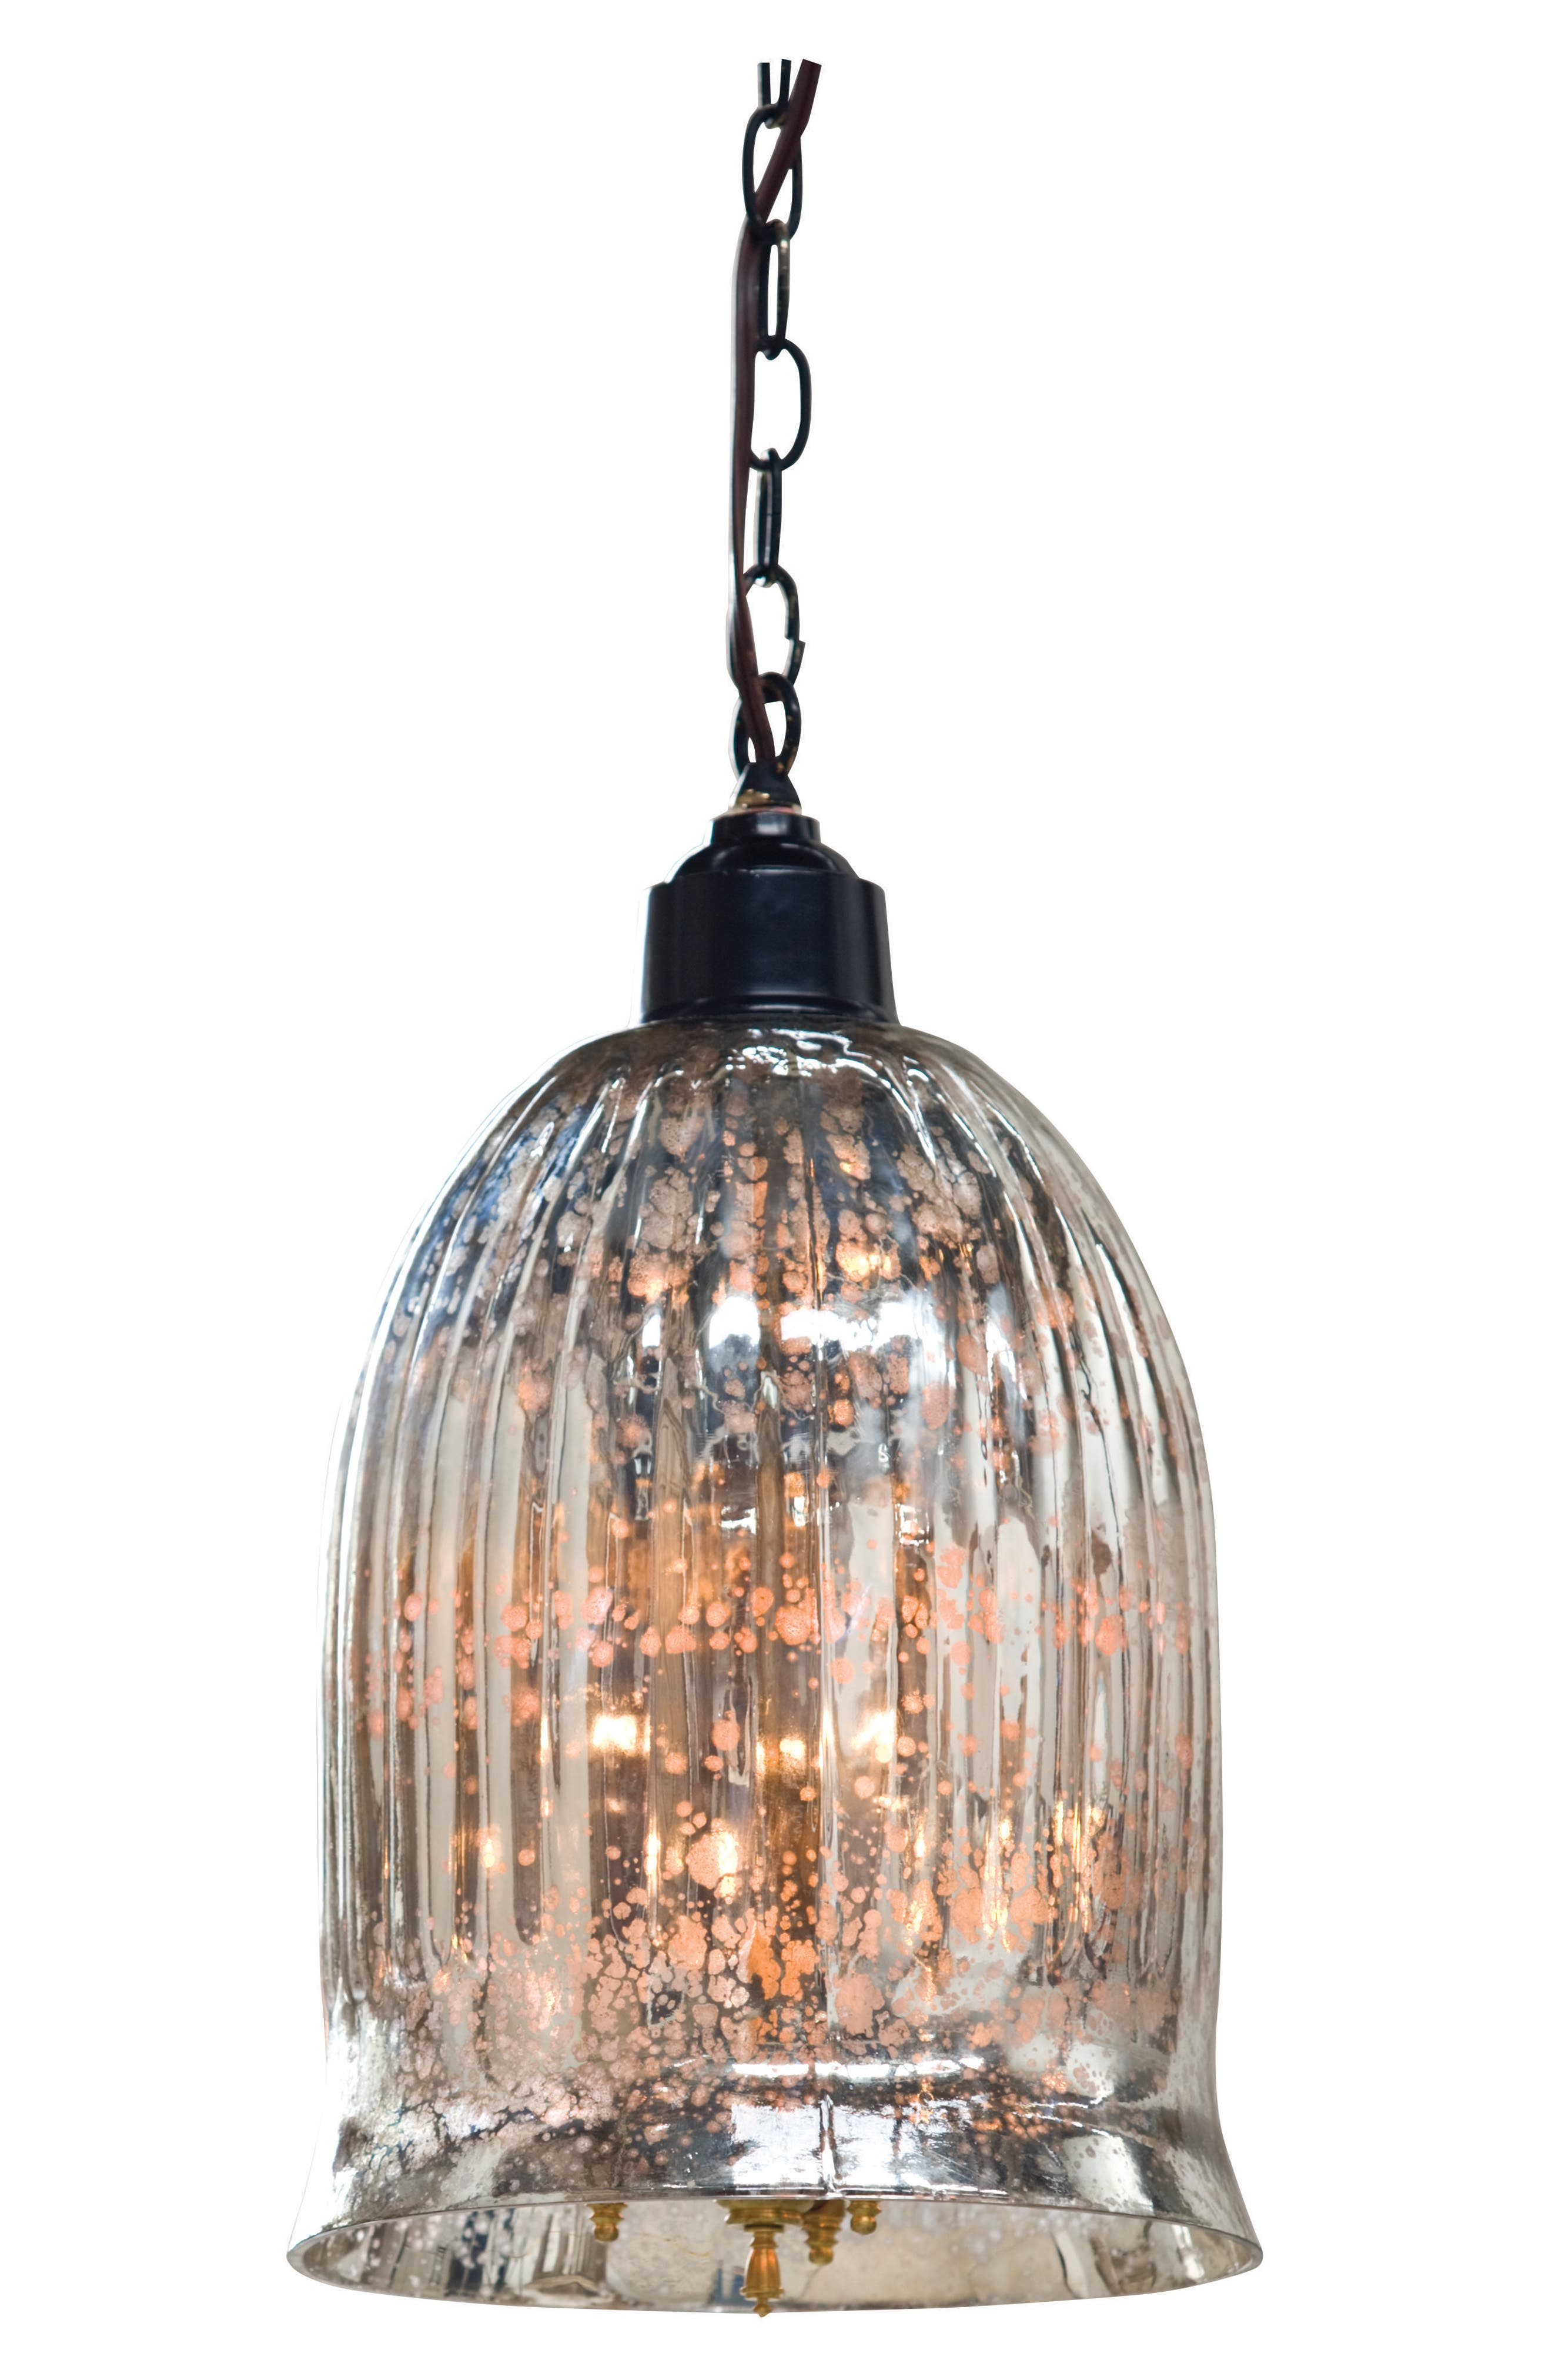 Antiqued Mercury Pendant Lamp,                             Main thumbnail 1, color,                             040